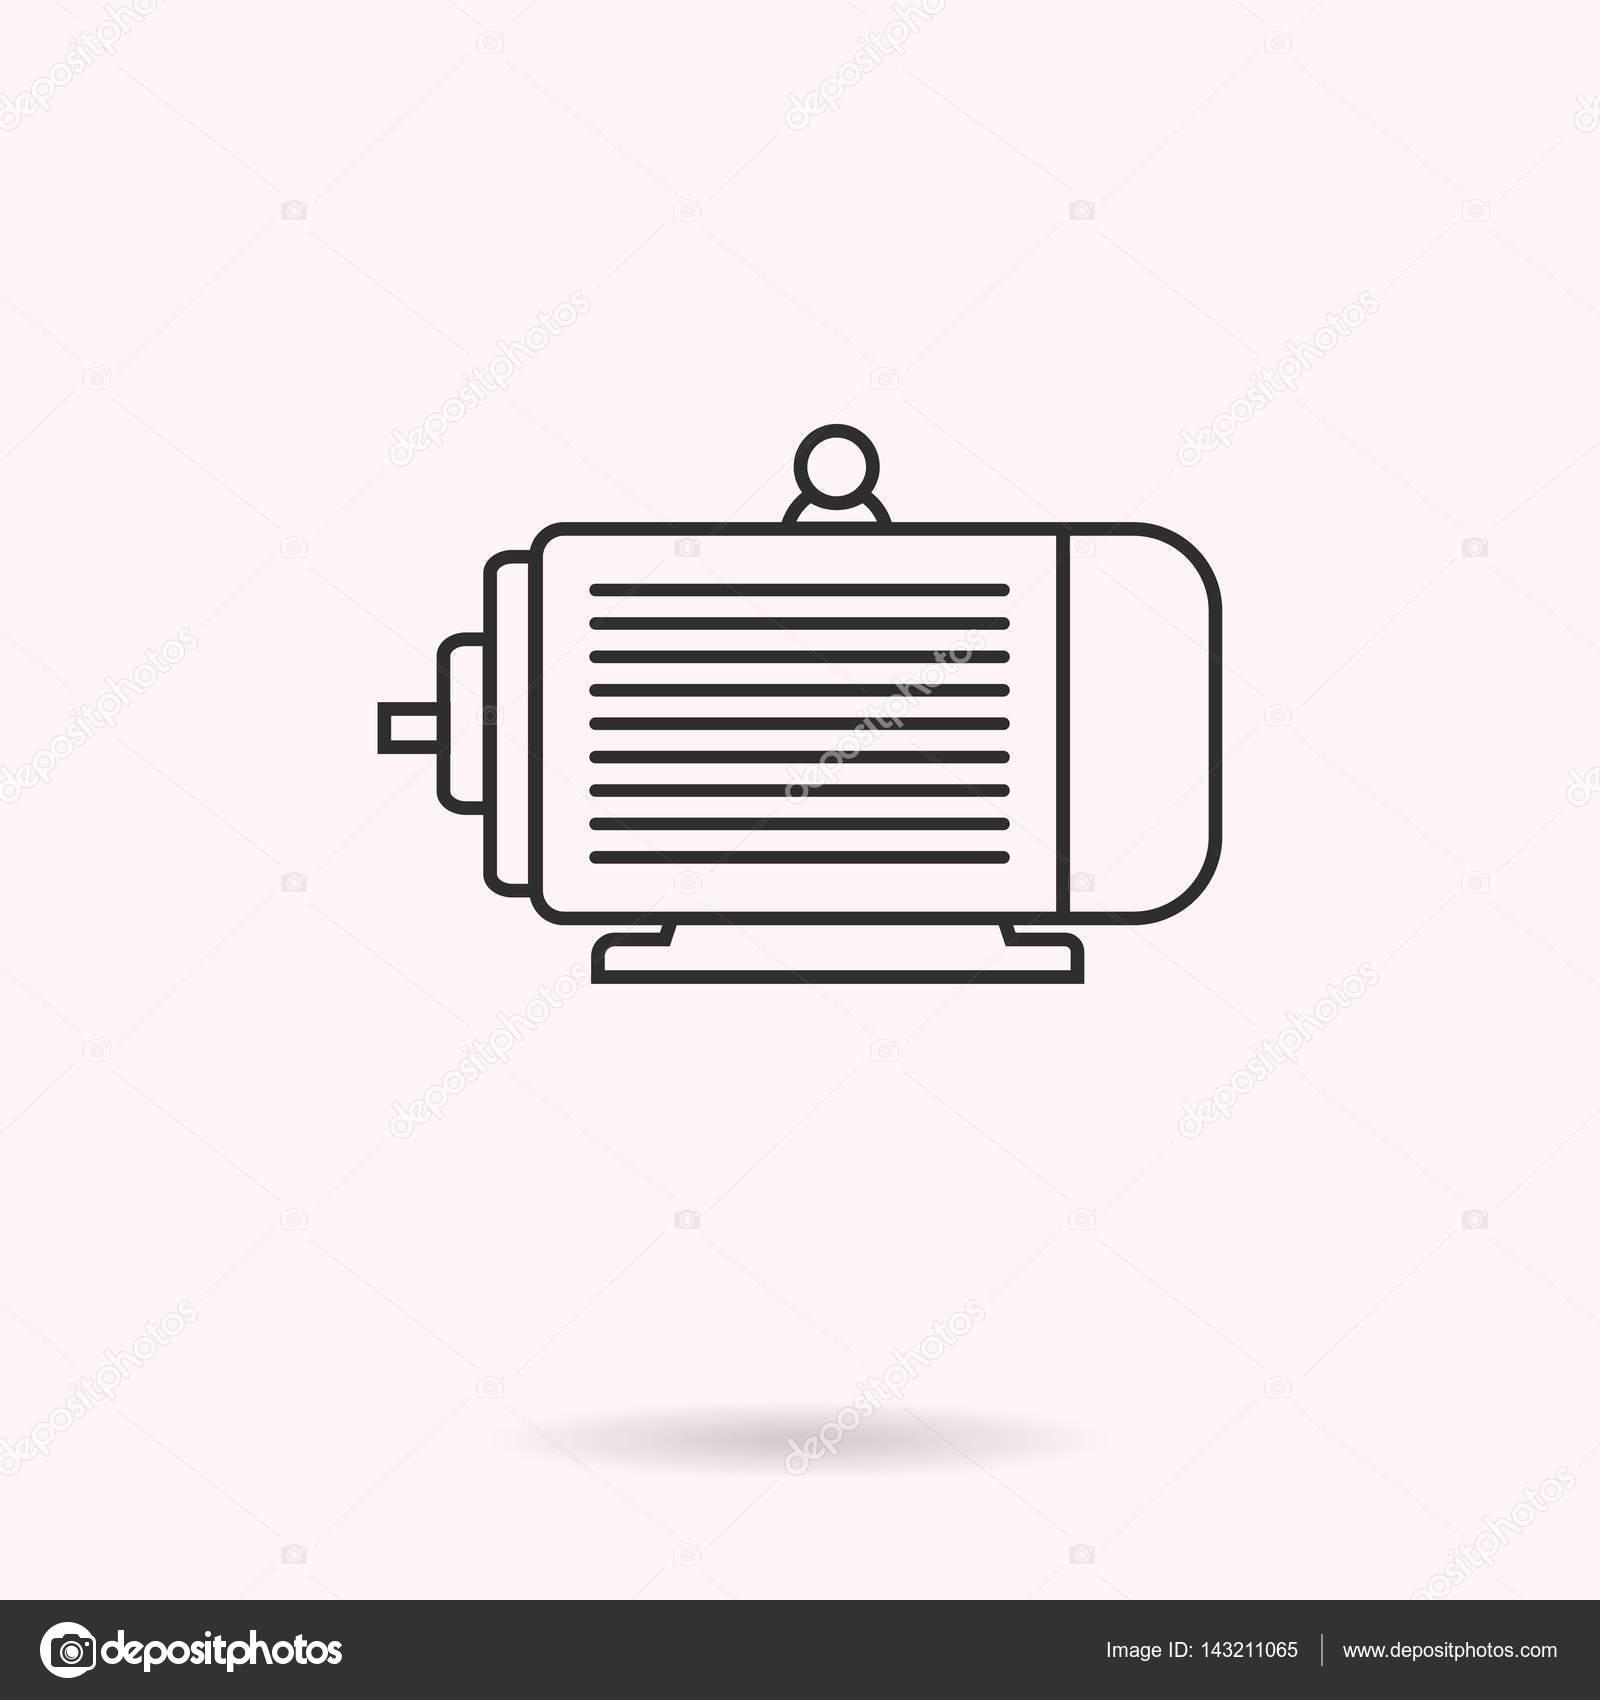 Motor eltrico cone vector vetores de stock lovemask 143211065 motor eltrico cone vector vetores de stock ccuart Choice Image